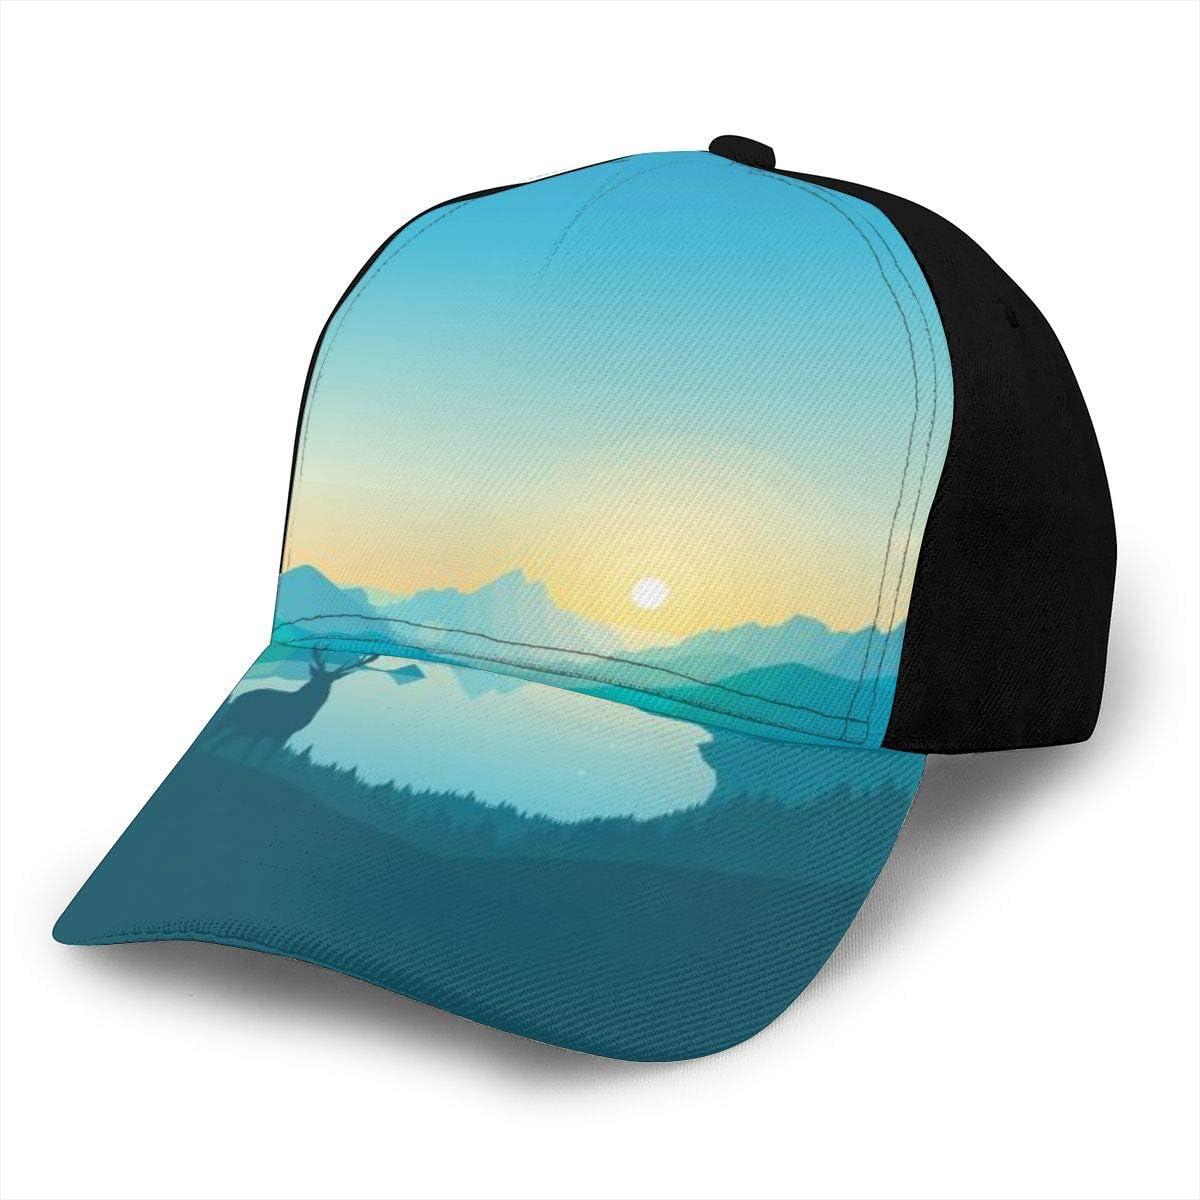 Blue Mountain Deer Silhouette Painting Classic Baseball Cap Men Women Dad Hat Twill Adjustable Size Black